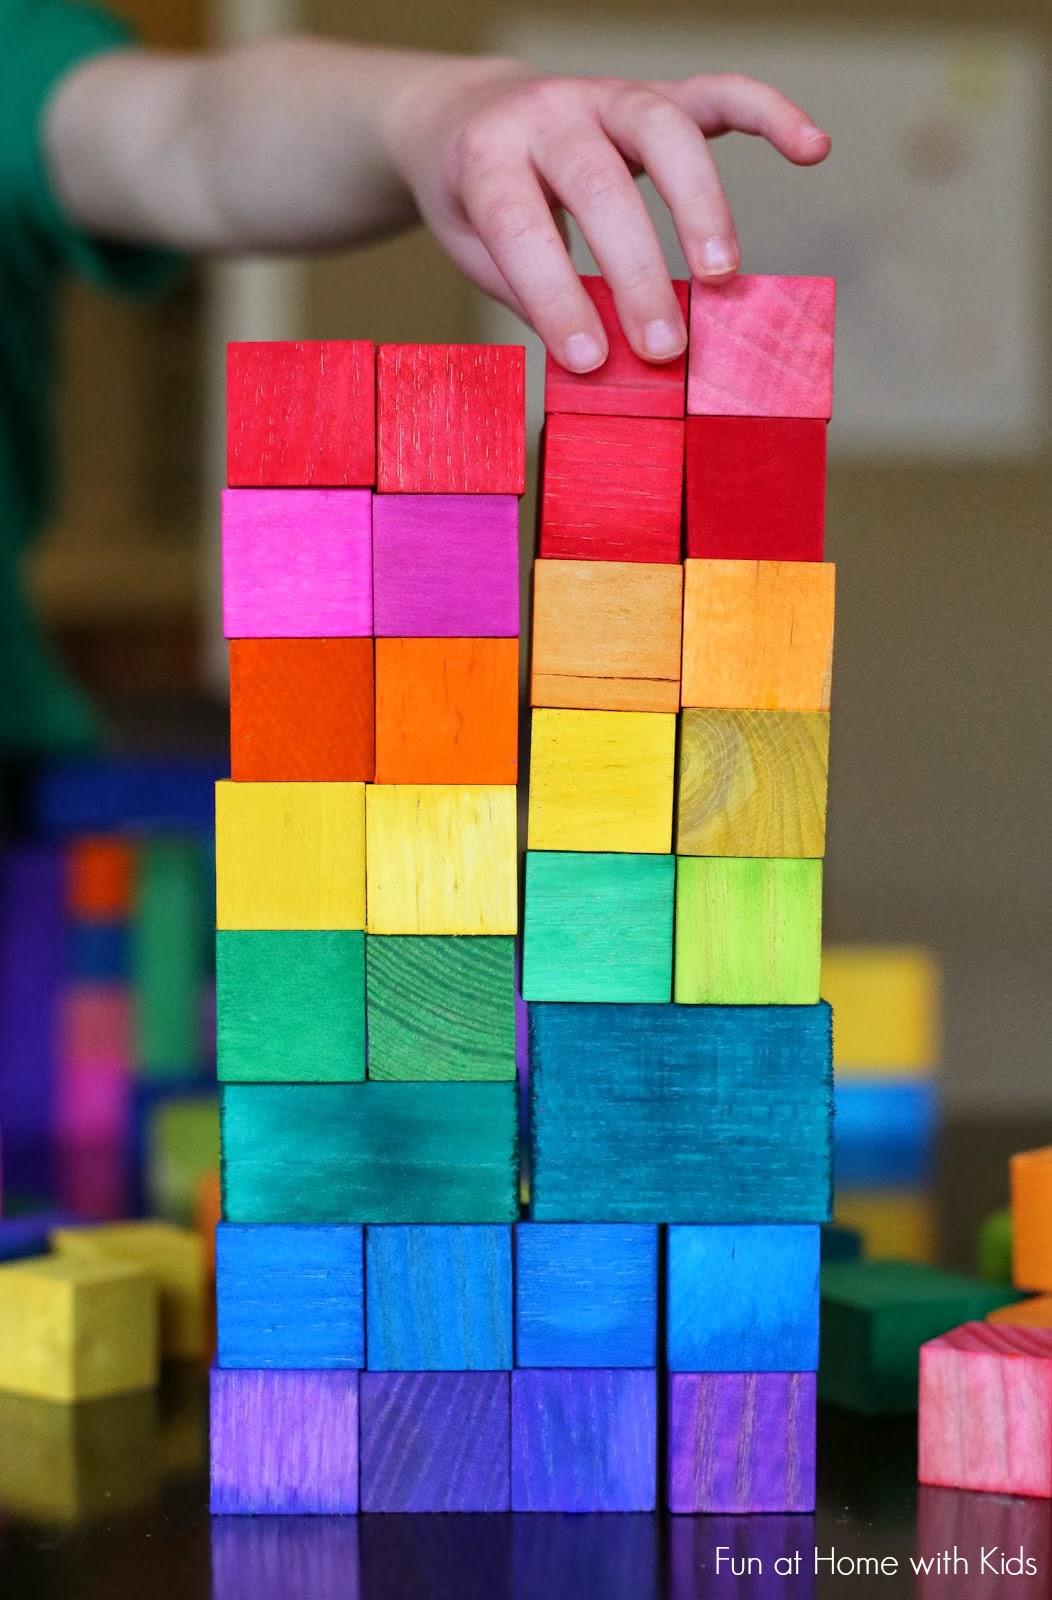 Diy Dyed Rainbow Grimm Style Wooden Blocks